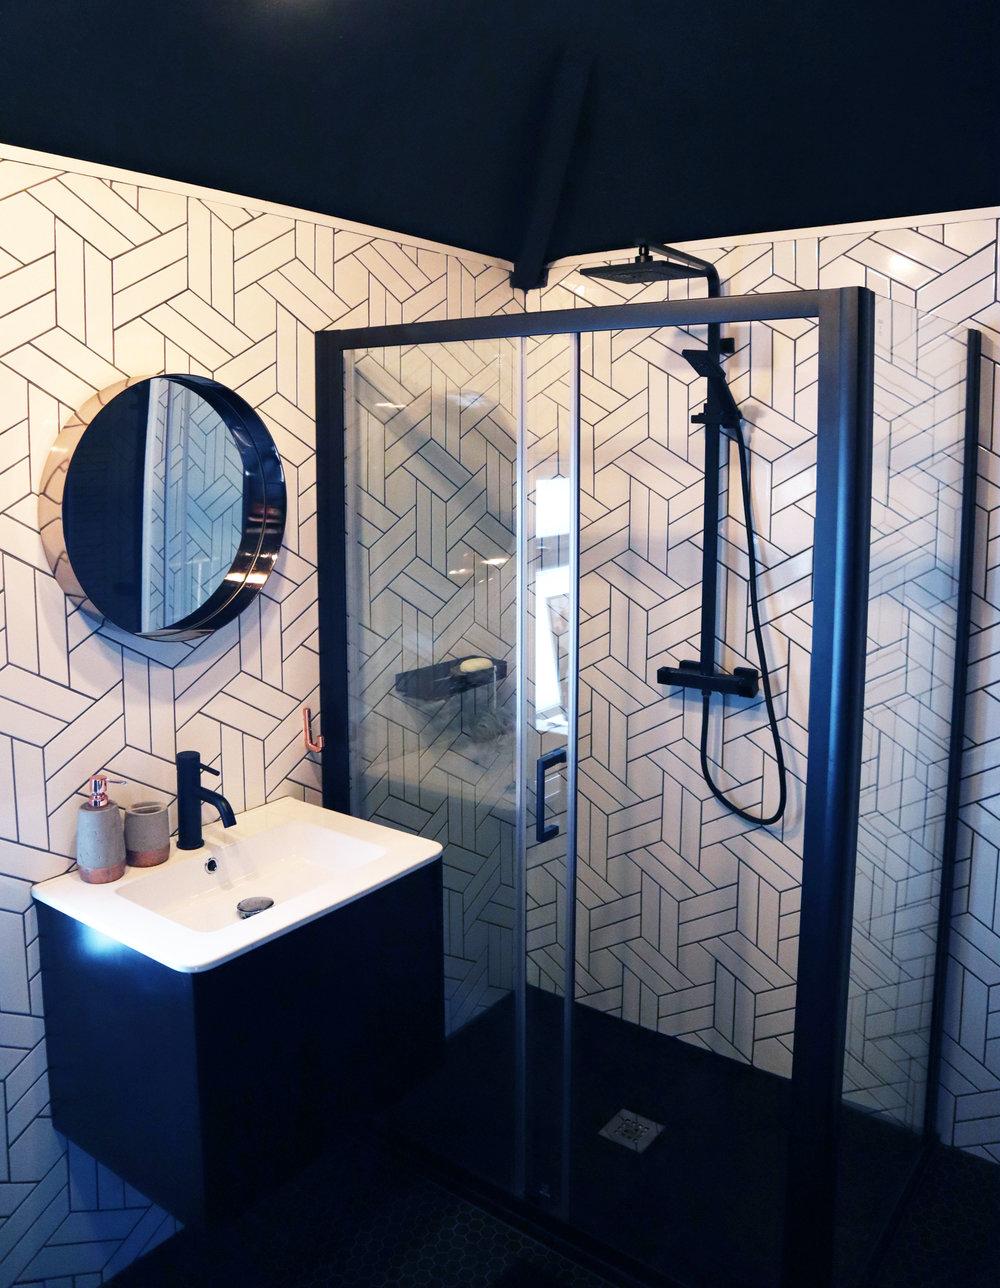 SpaceyStudio_BathroomRedesign1